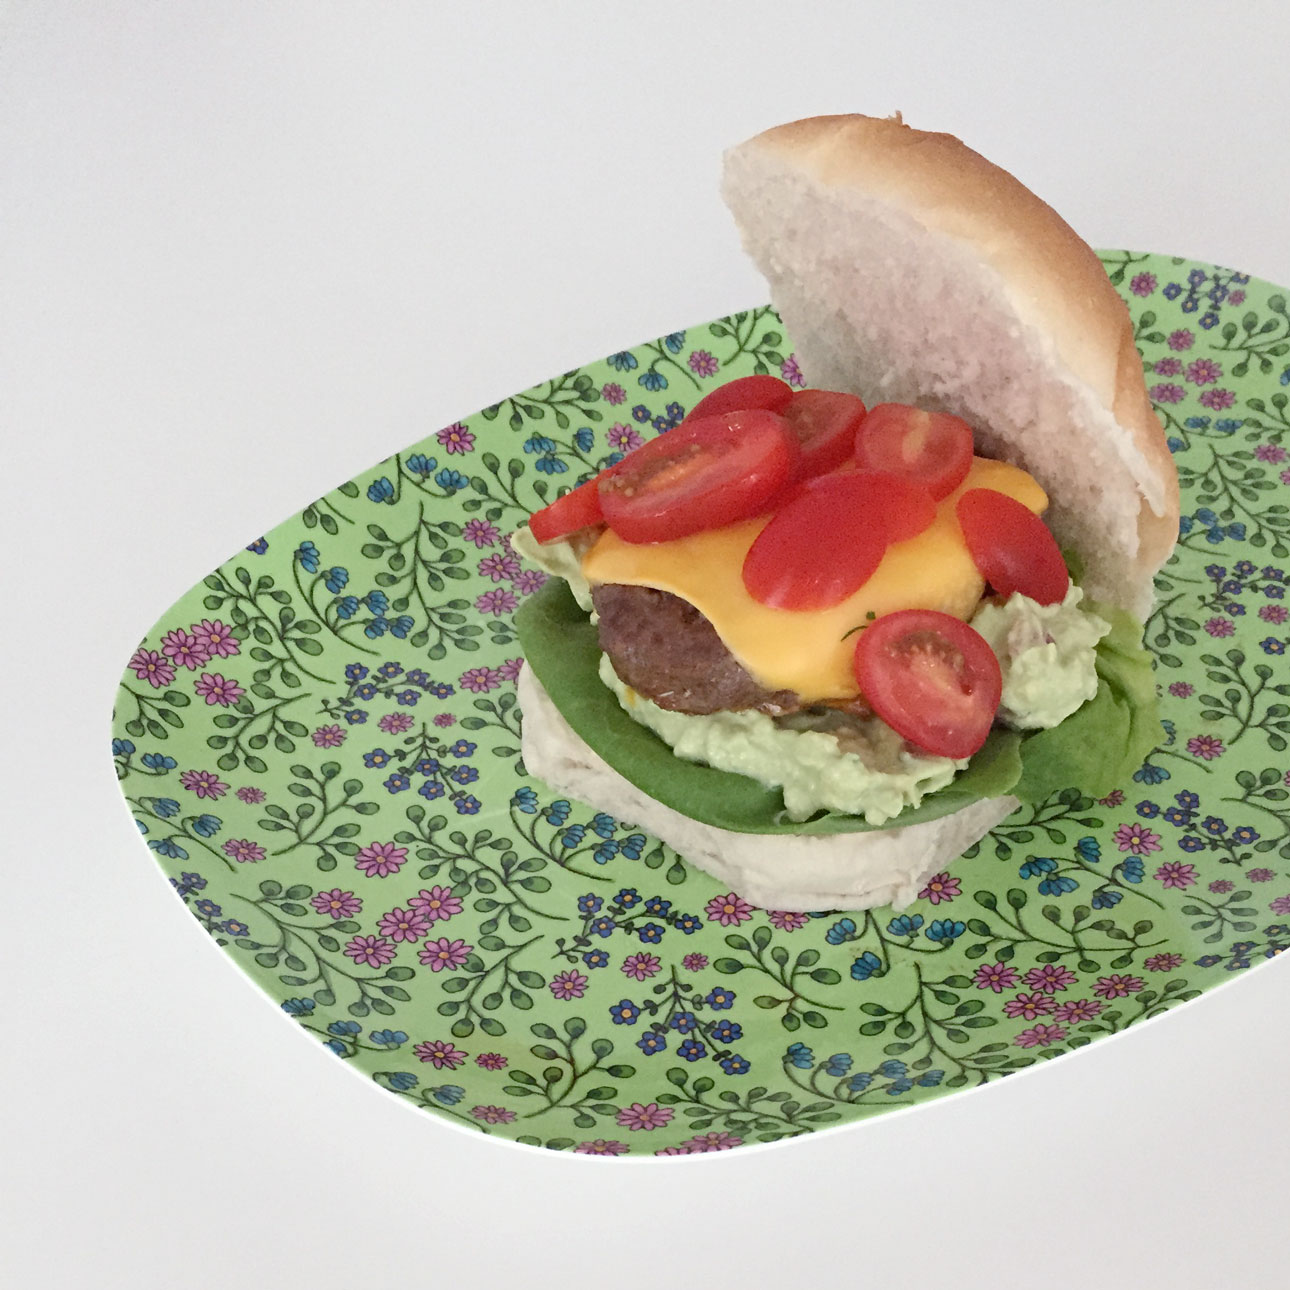 Mamalifestyle Marike augustus 2015 hamburger met guacamole